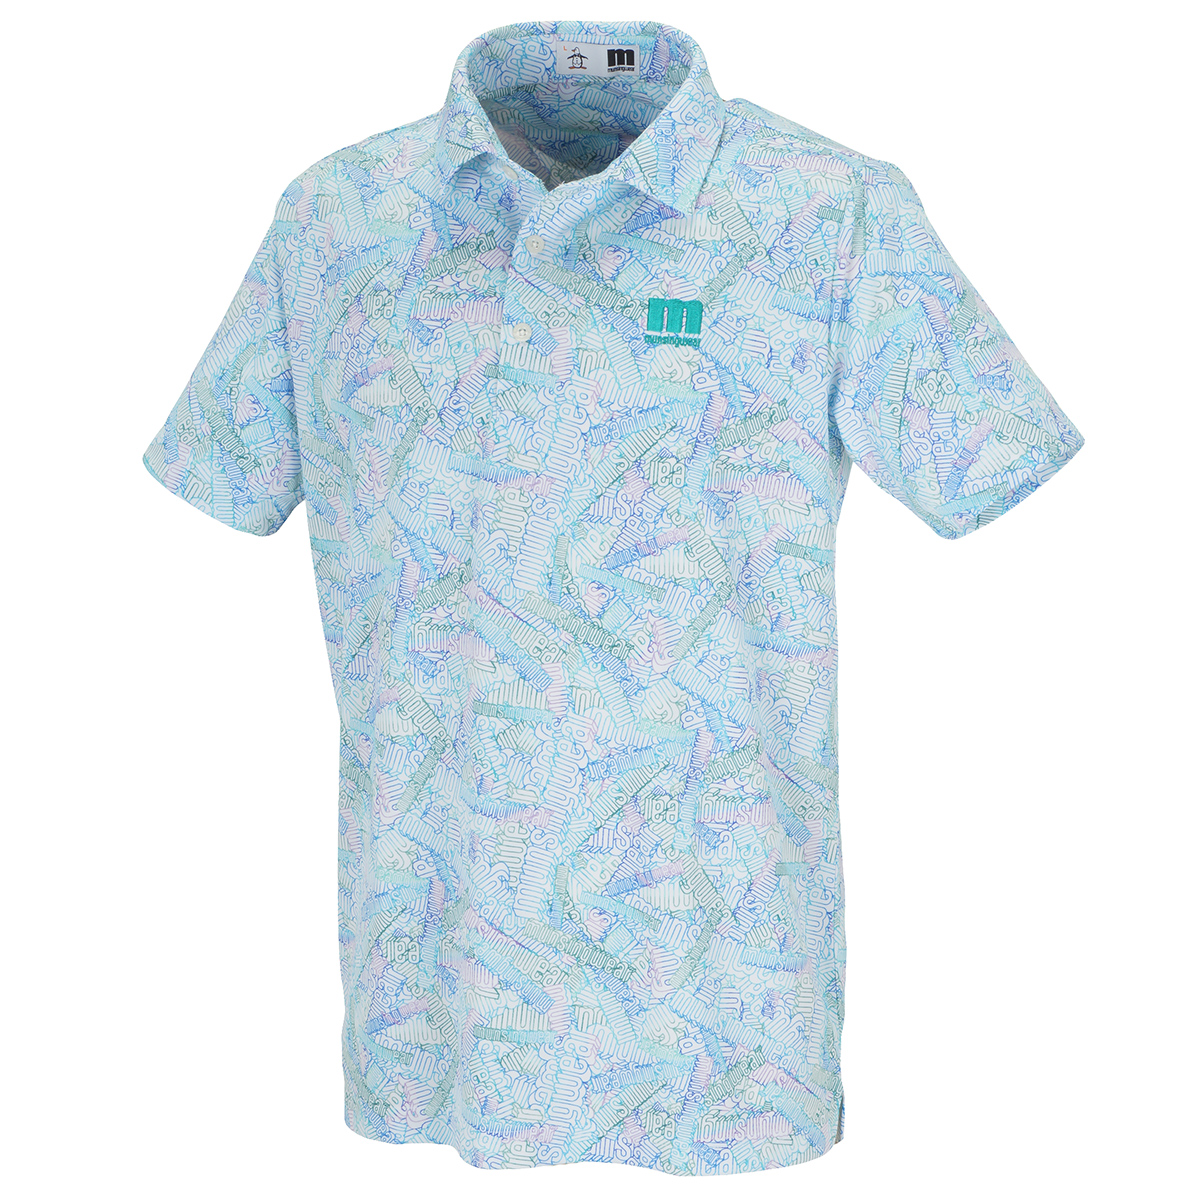 ENVOY COOLIST3Dロゴプリント半袖ポロシャツ